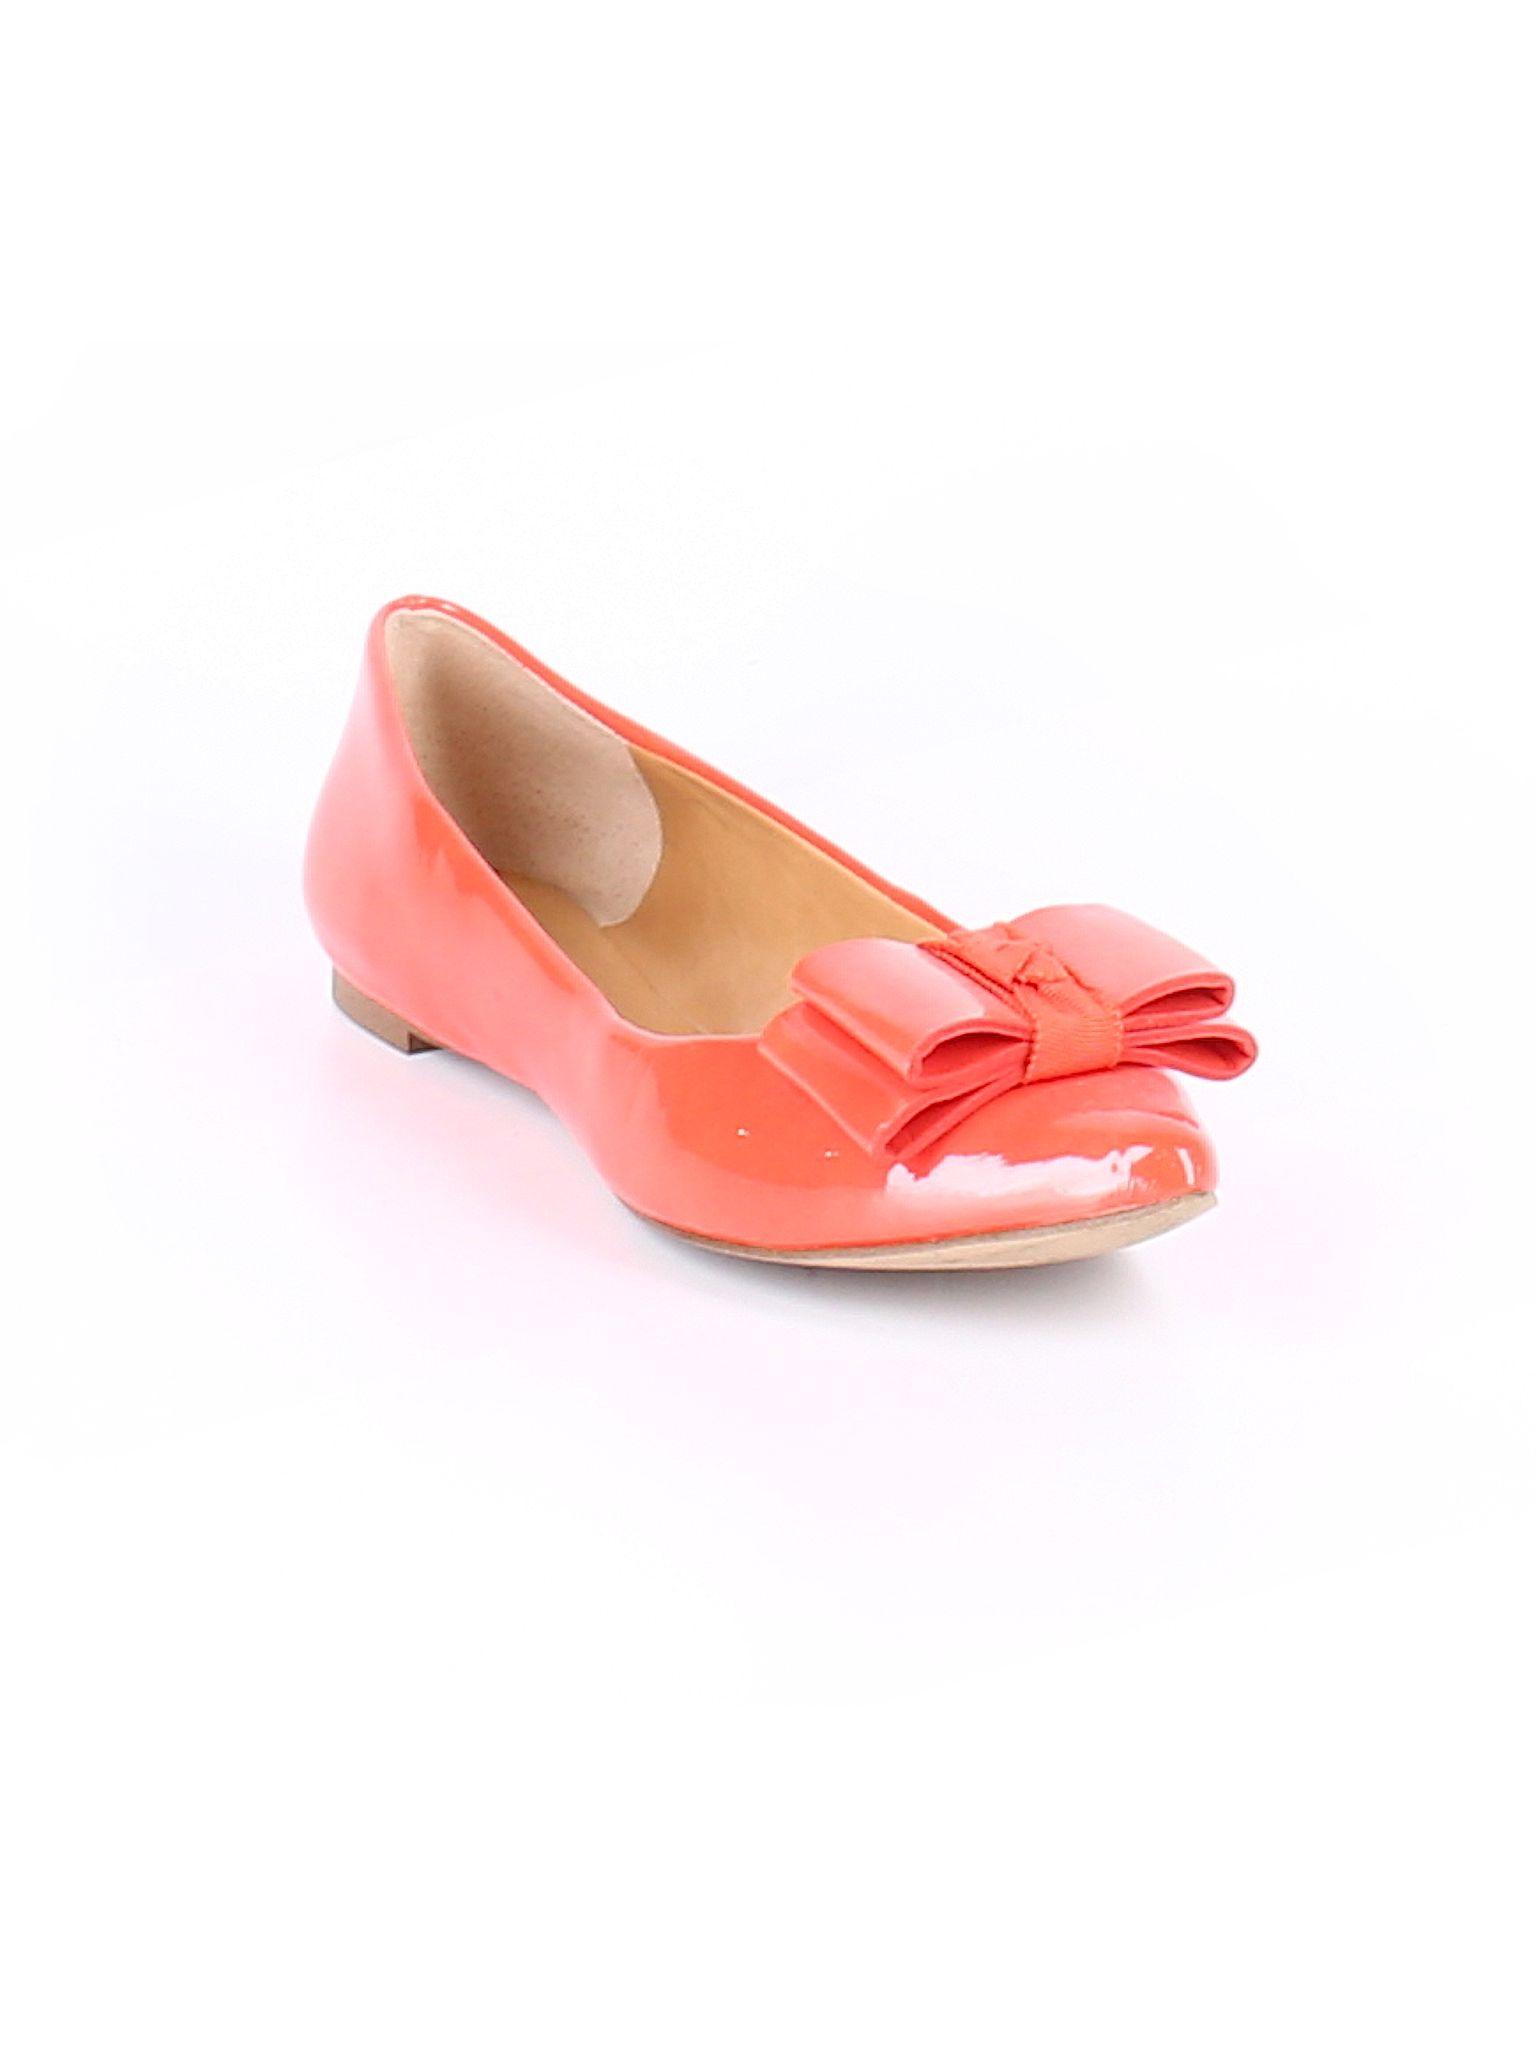 4d0bdb616 J. Crew Factory Store Flats: Size 6.00 Orange Women's Clothing - $27.99